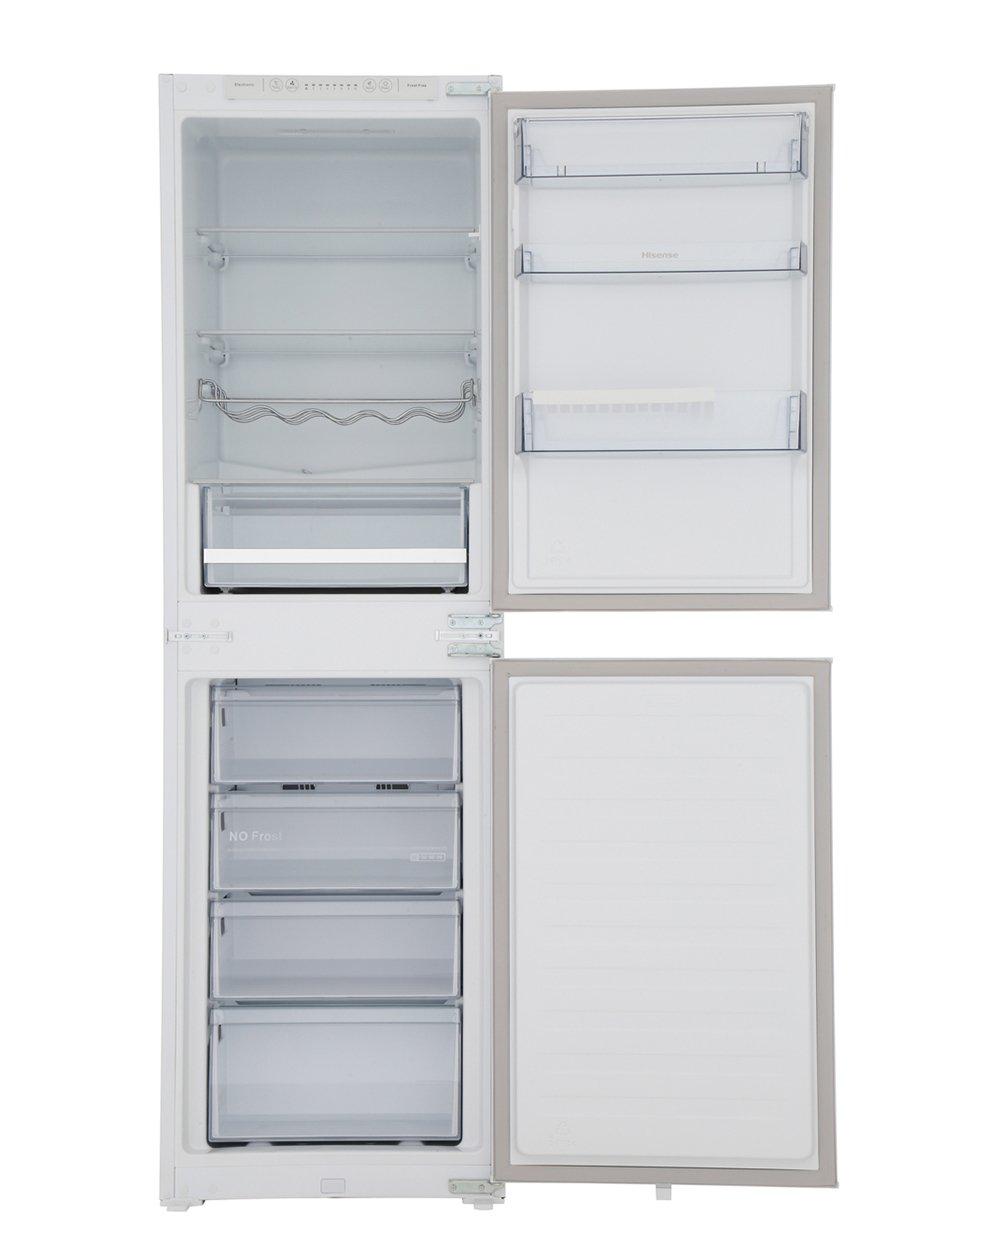 Hisense RIB291F4AW1 Frost Free Integrated Fridge Freezer